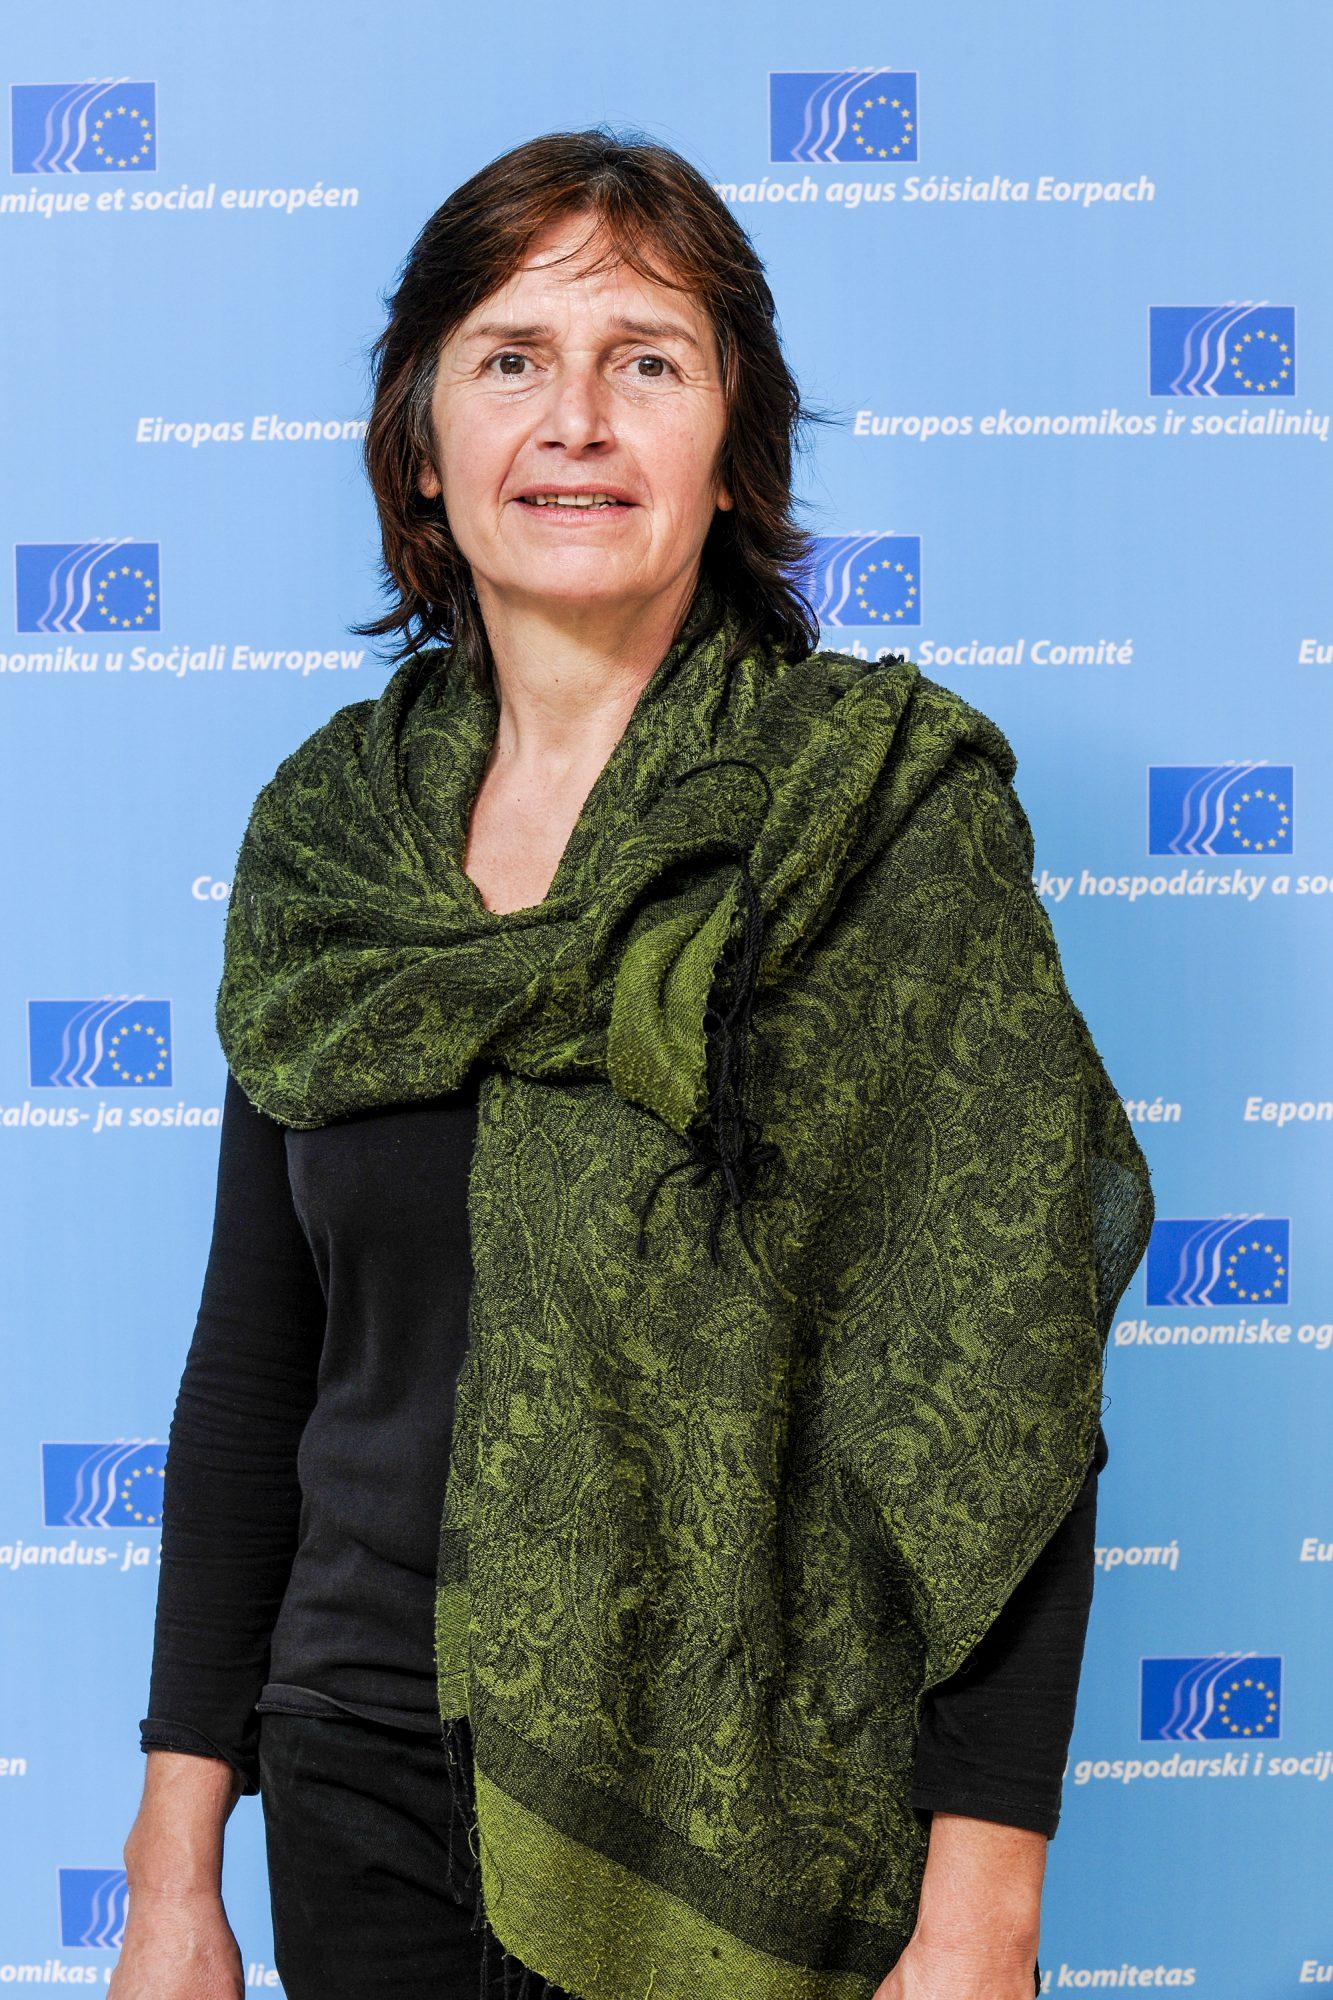 Geneviève Savigny,